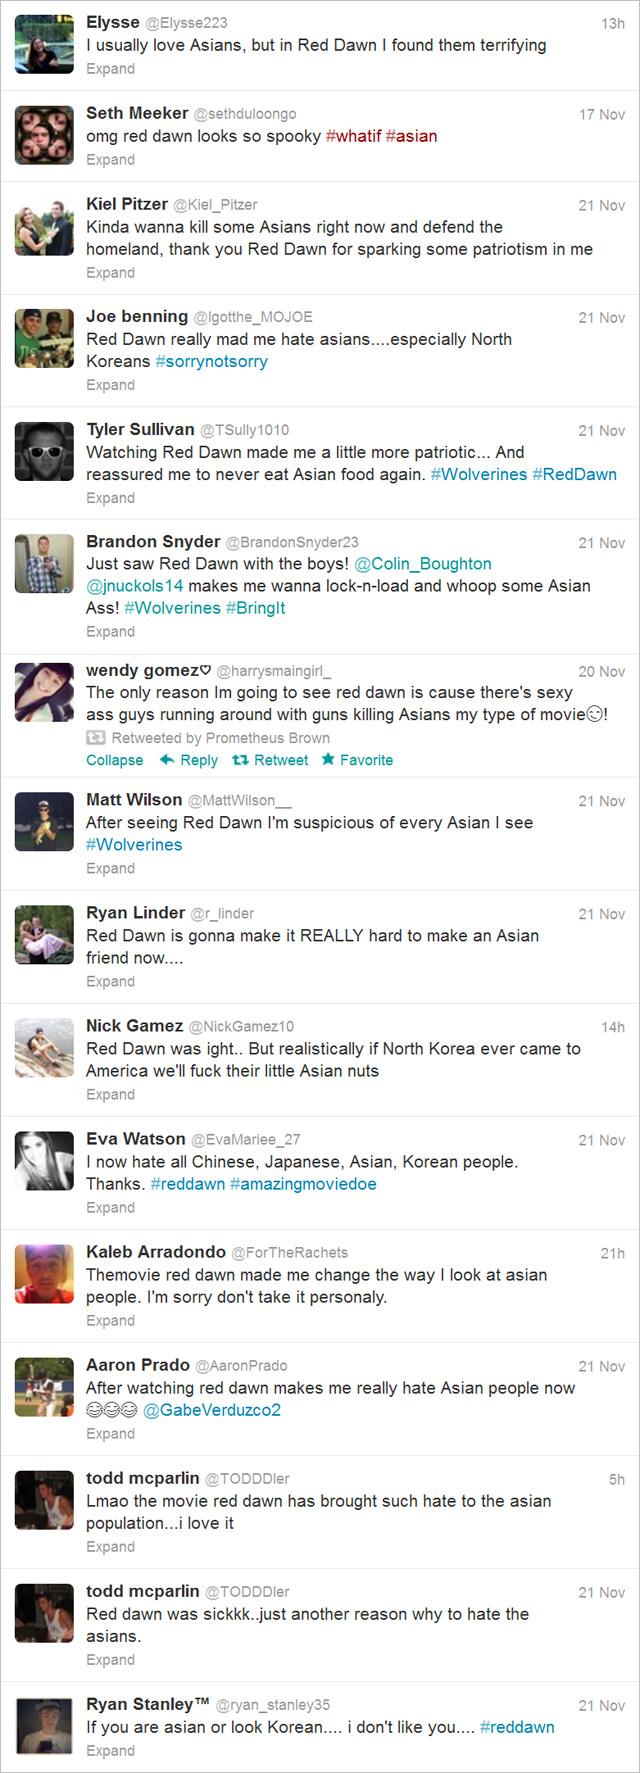 Racist tweets after watching Red Dawn Todd McParlin Aaron Prado Eva Watson Wendy Gomez Joe Benning Kiel Pitzer